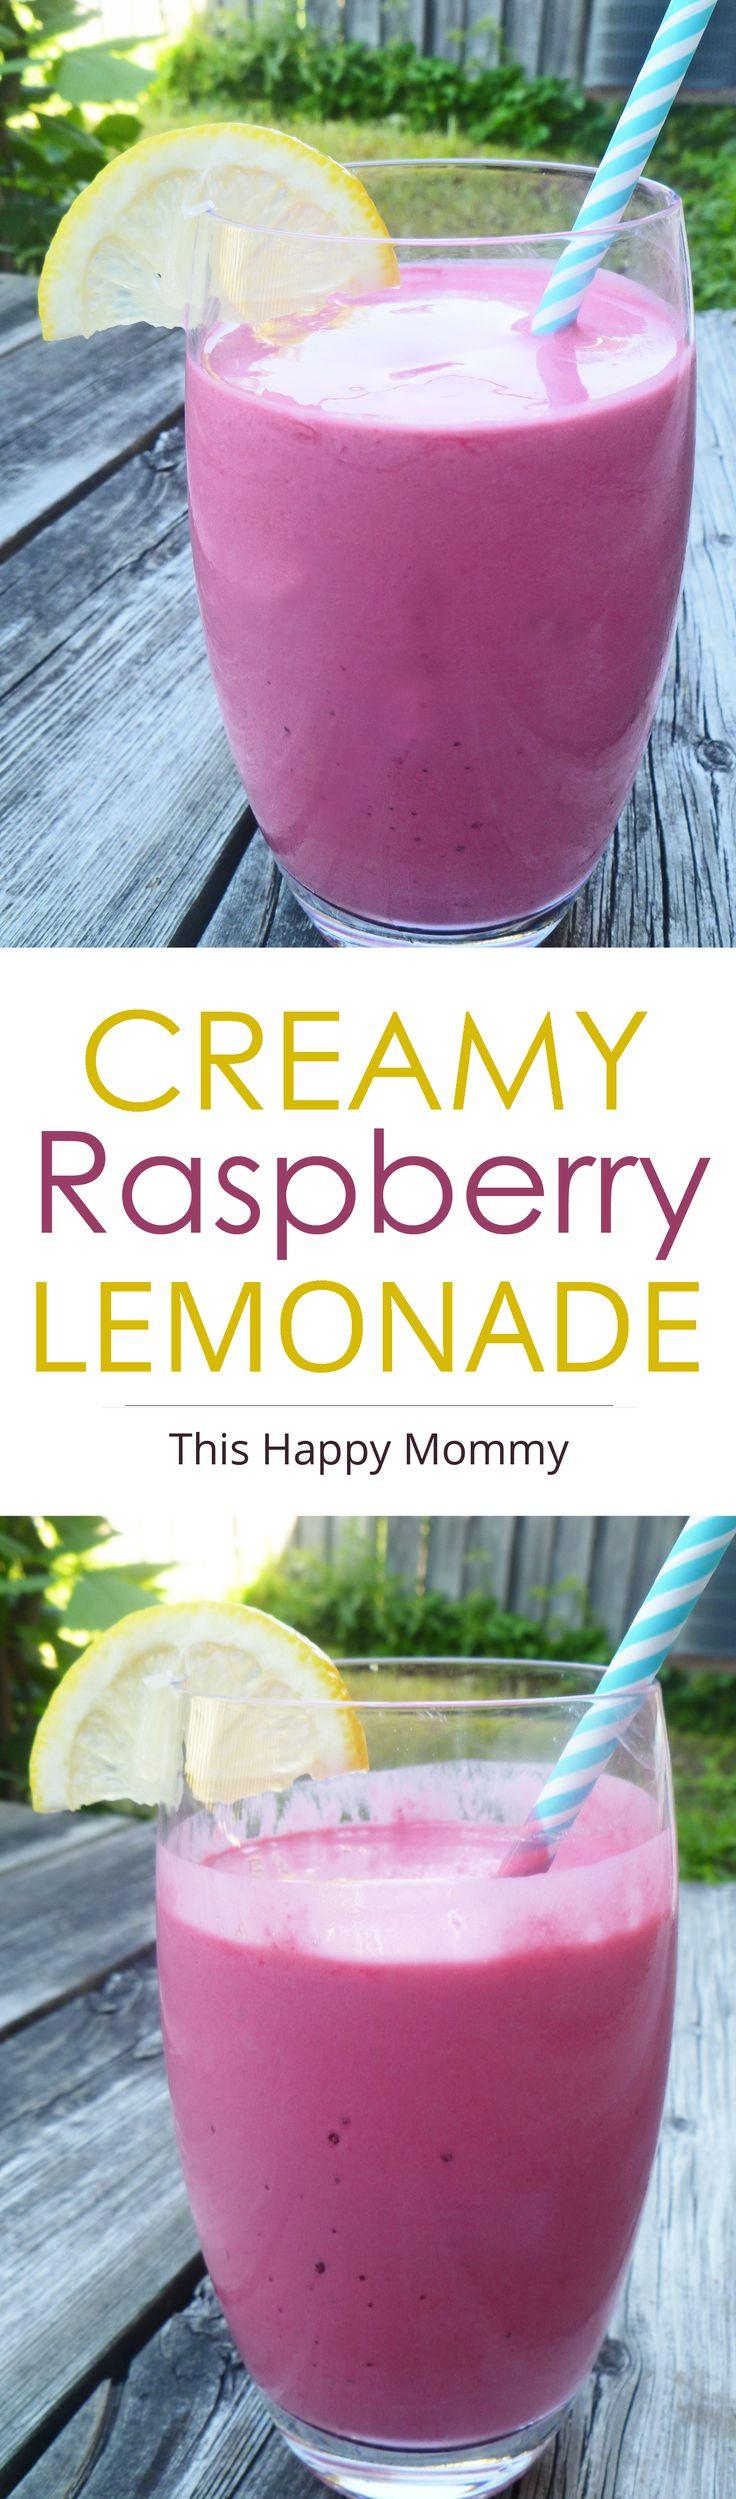 Creamy Raspberry Lemonade -- Tart, sweet, and bursting with creamy raspberry lemon flavour. Creamy Raspberry Lemonade is a perfect summertime drink you can enjoy all season long. | thishappymommy.com